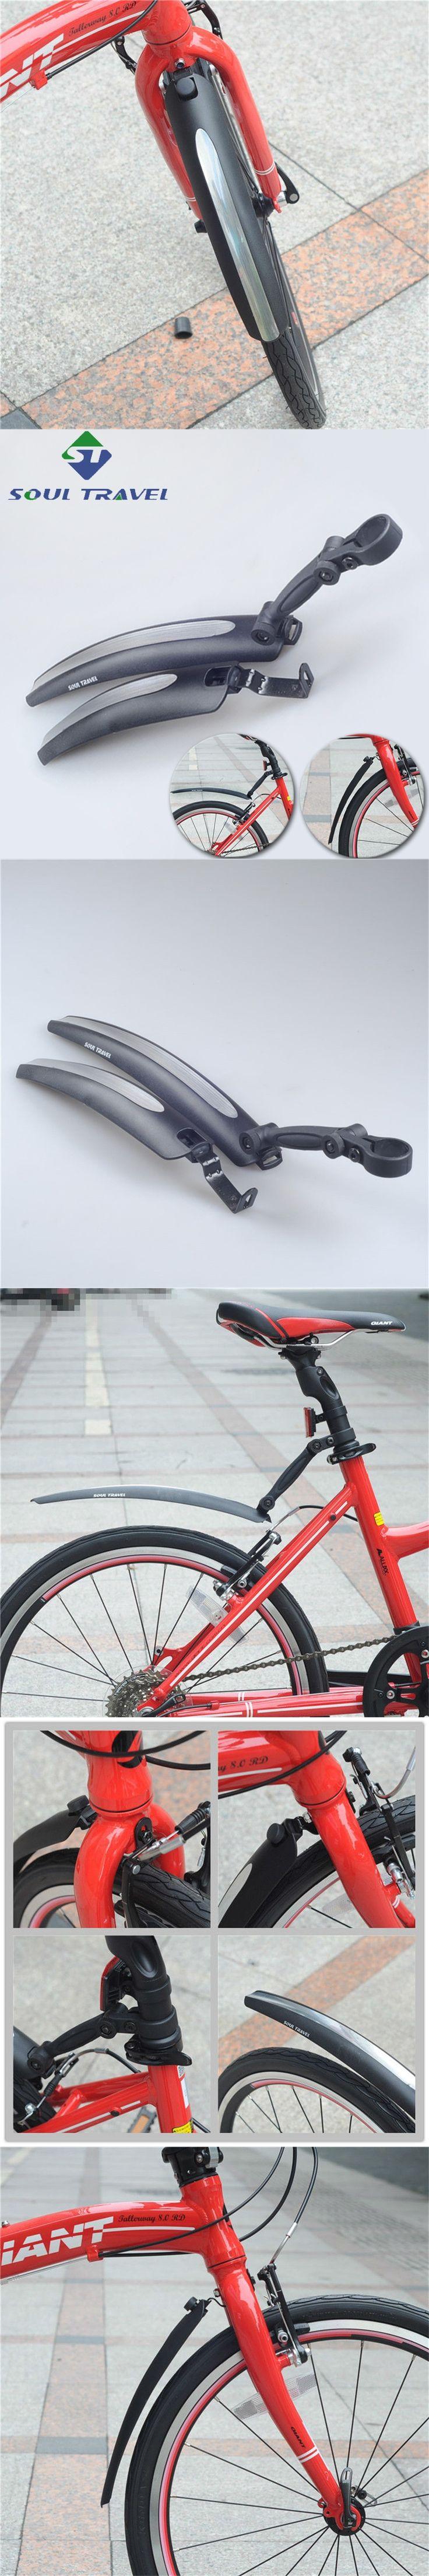 Soul Travel 16 20 Inch Cycling Plastic Folding Bike Fender Dirt Mud Bridge Front Rear Fenders Set Quick Release Bicycle Mudguard